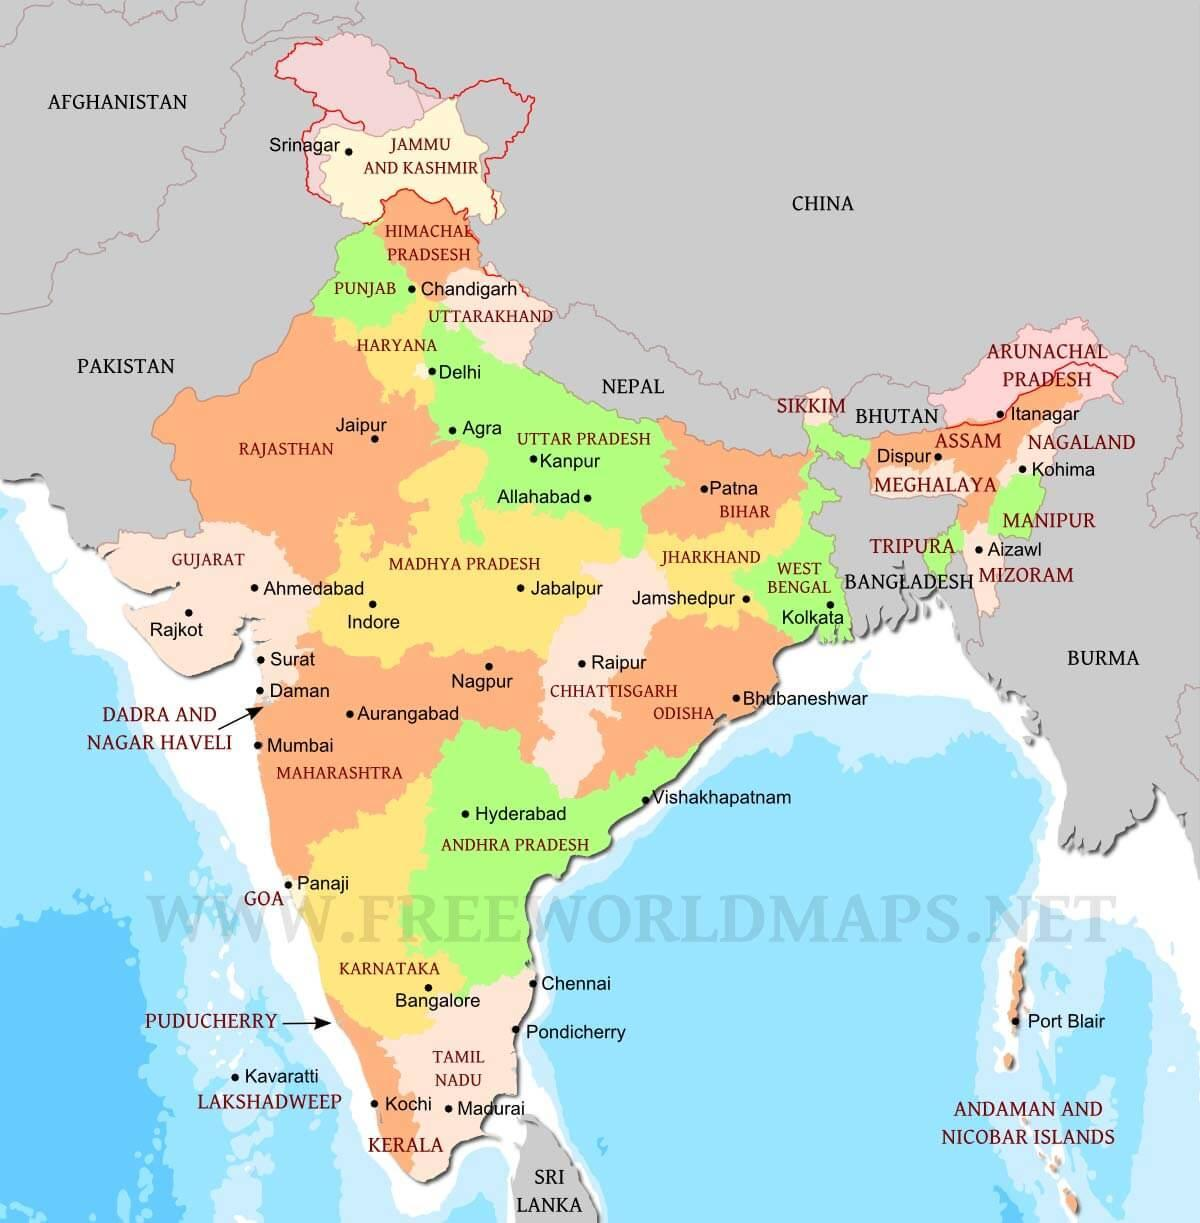 Cartina India Nord.India Del Nord Mappa Politica Cartina Politica Dell India Del Nord Sud Est Asiatico Asia